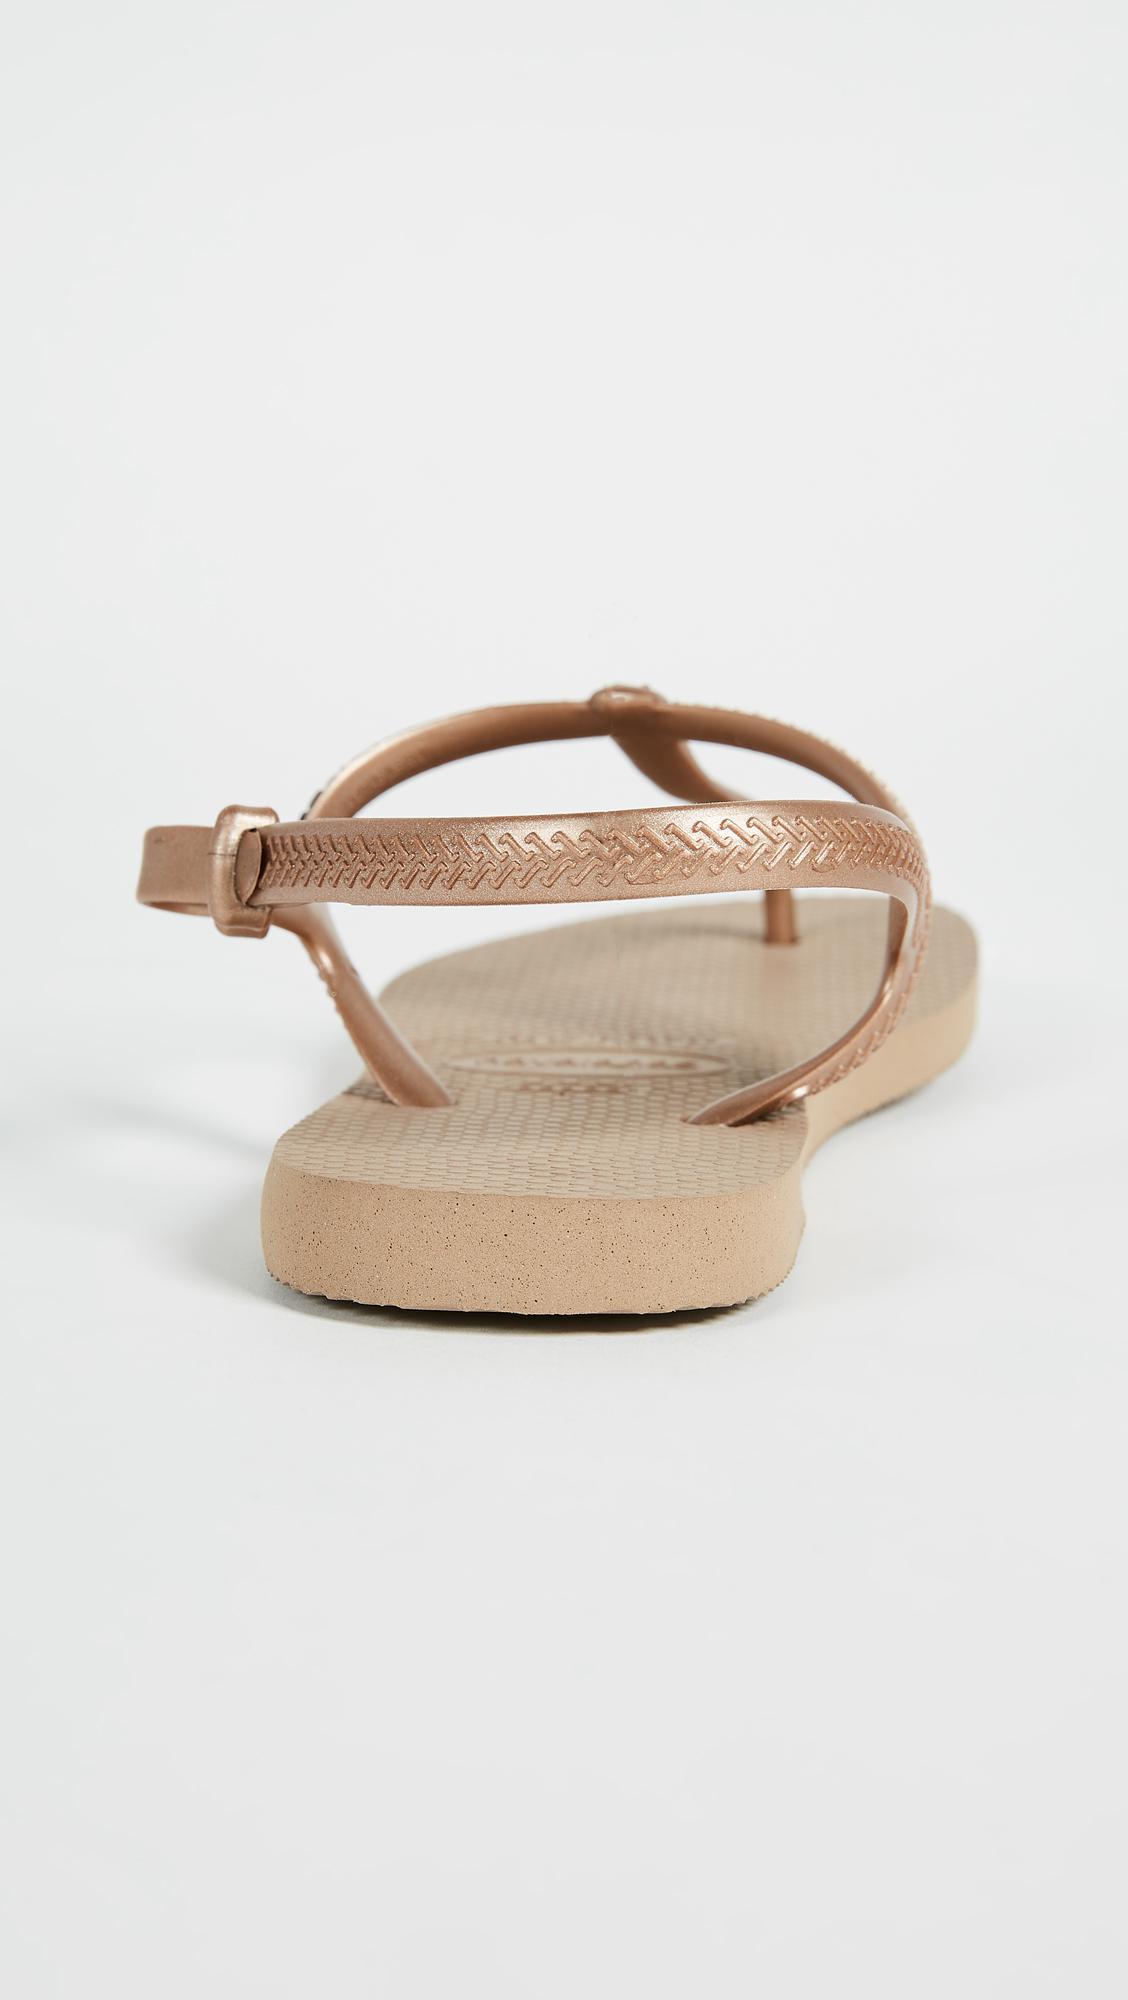 deacc64d91580e Havaianas - Multicolor Freedom T Strap Sandals - Lyst. View fullscreen